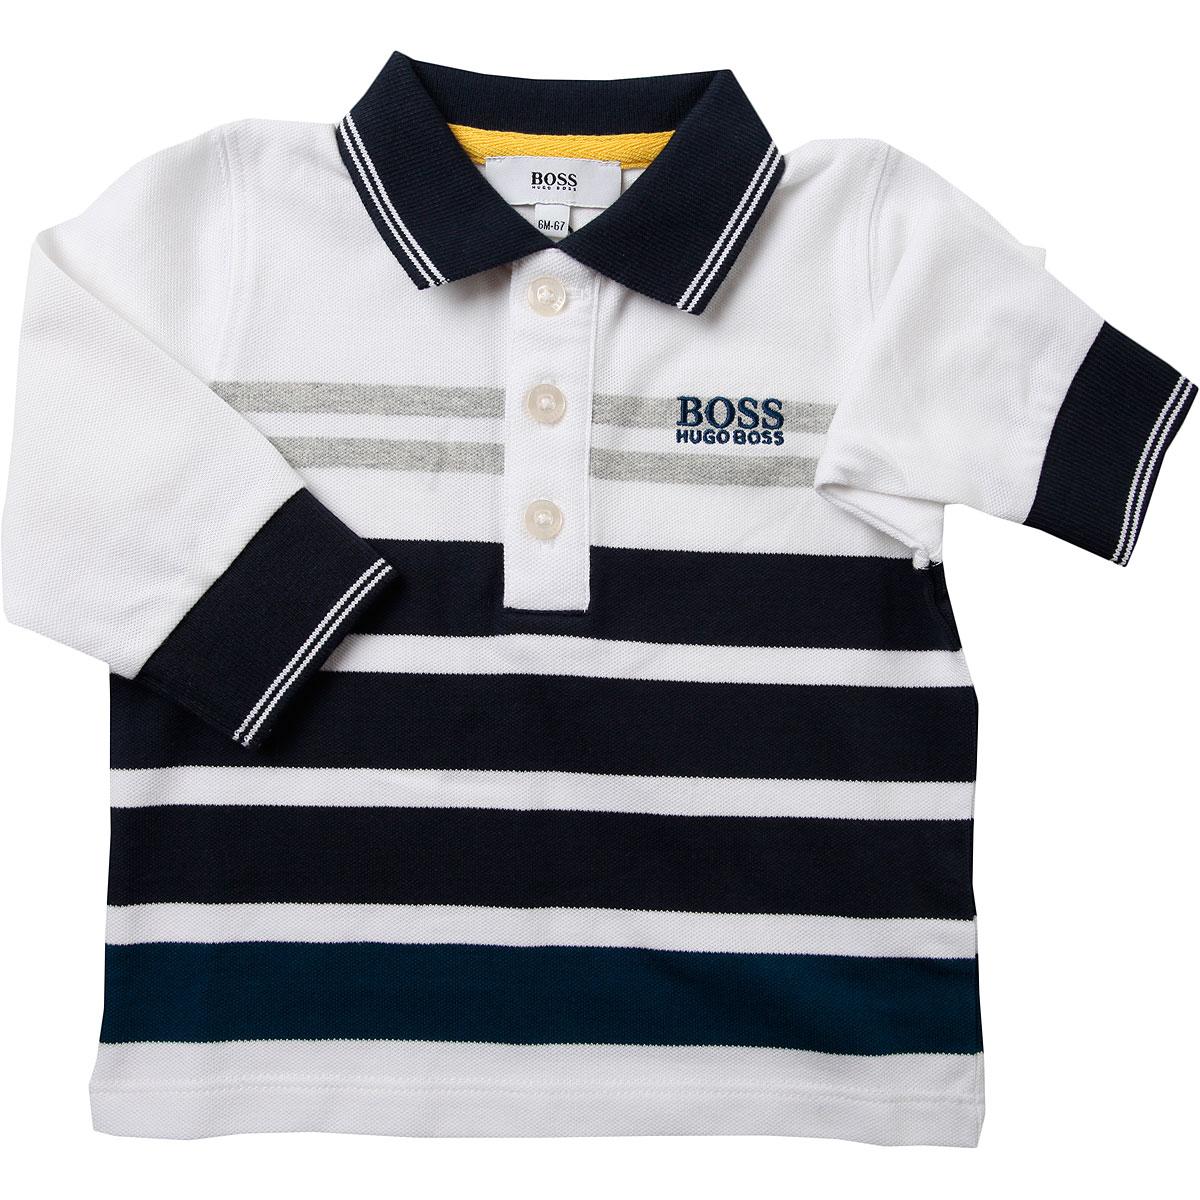 Image of Hugo Boss Baby Polo Shirt for Boys, White, Cotton, 2017, 12M 18M 2Y 3Y 6M 9M